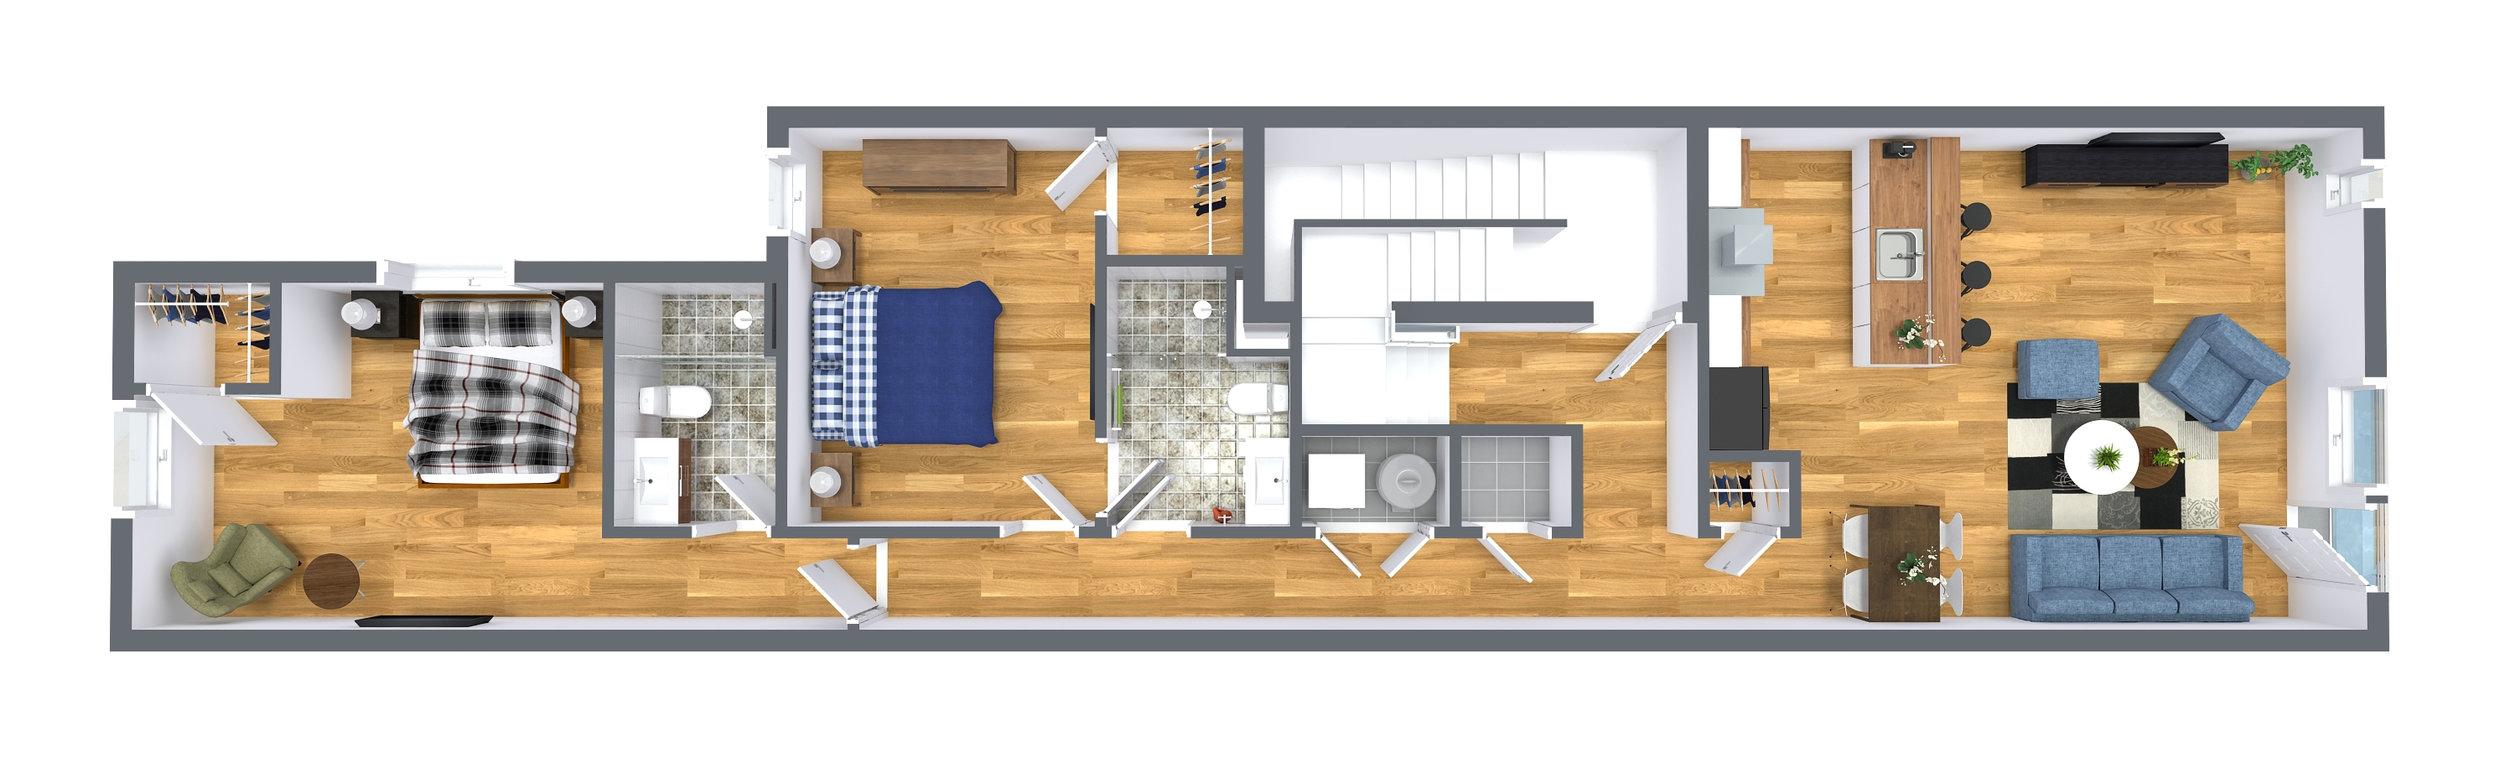 Level Three - Unit Flat Two Bedroom, Two Full Bathroom,1,150 SqrFt.